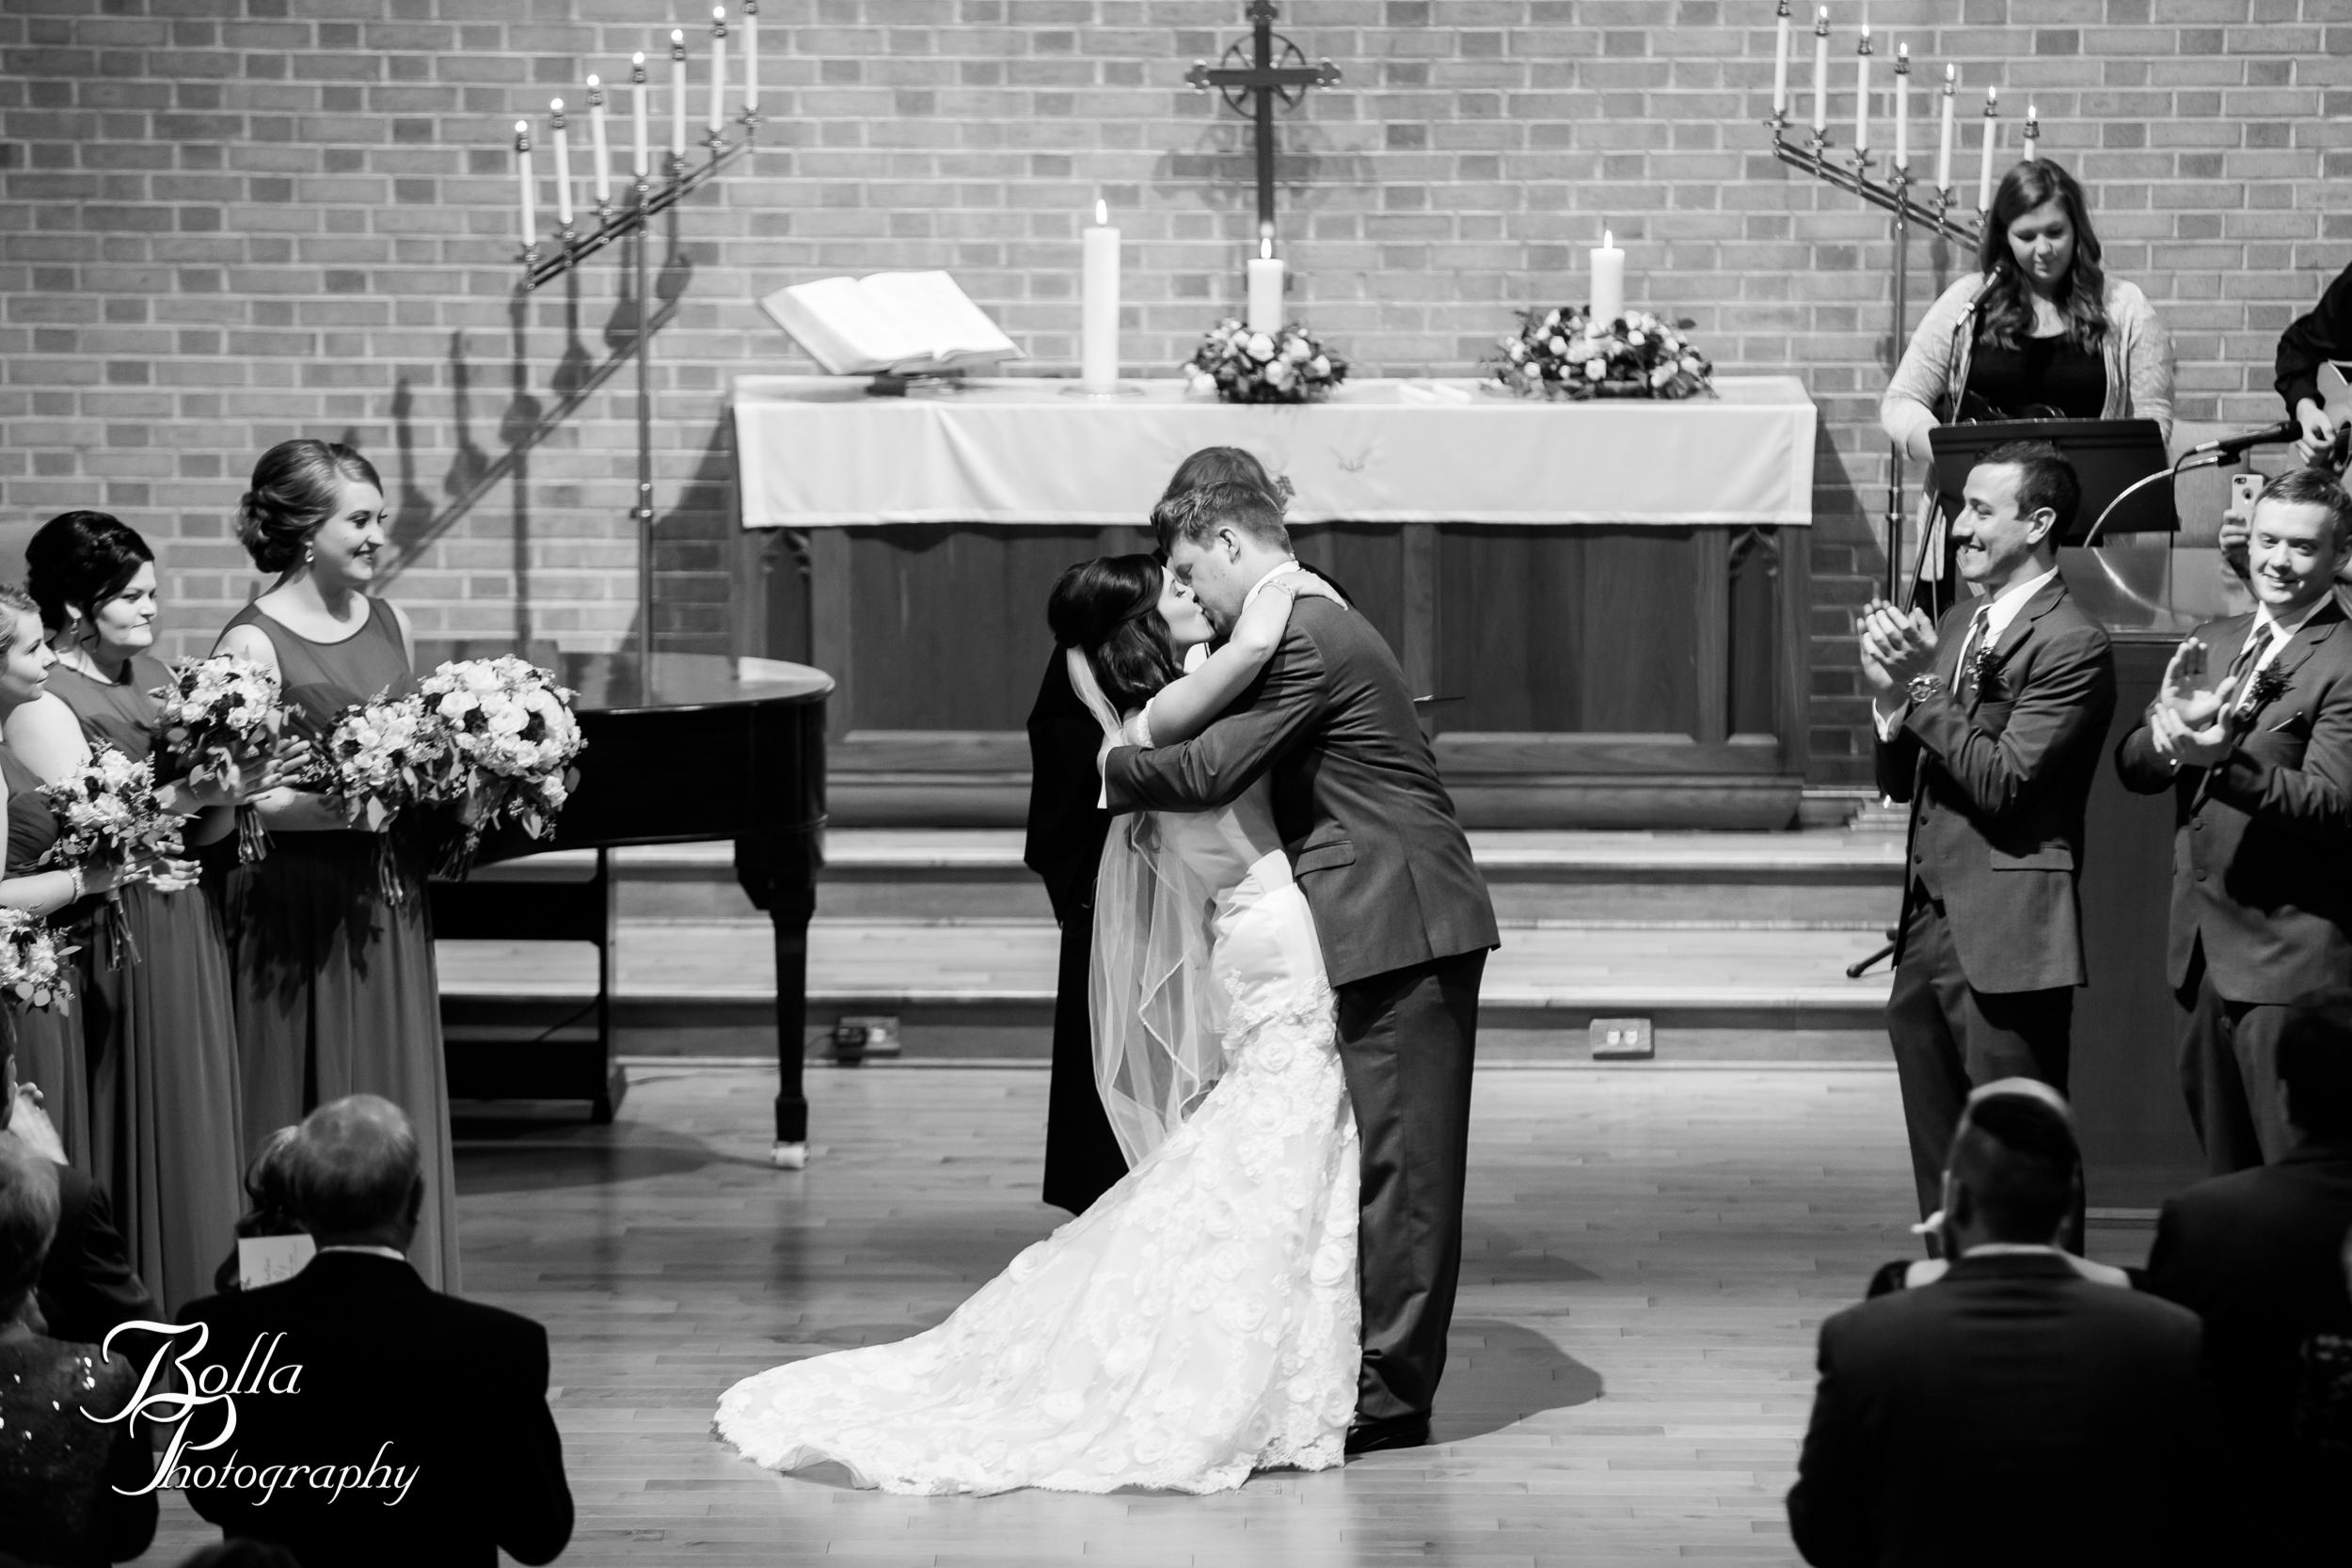 Bolla_photography_edwardsville_wedding_photographer_st_louis_weddings_Reilmann-0193.jpg